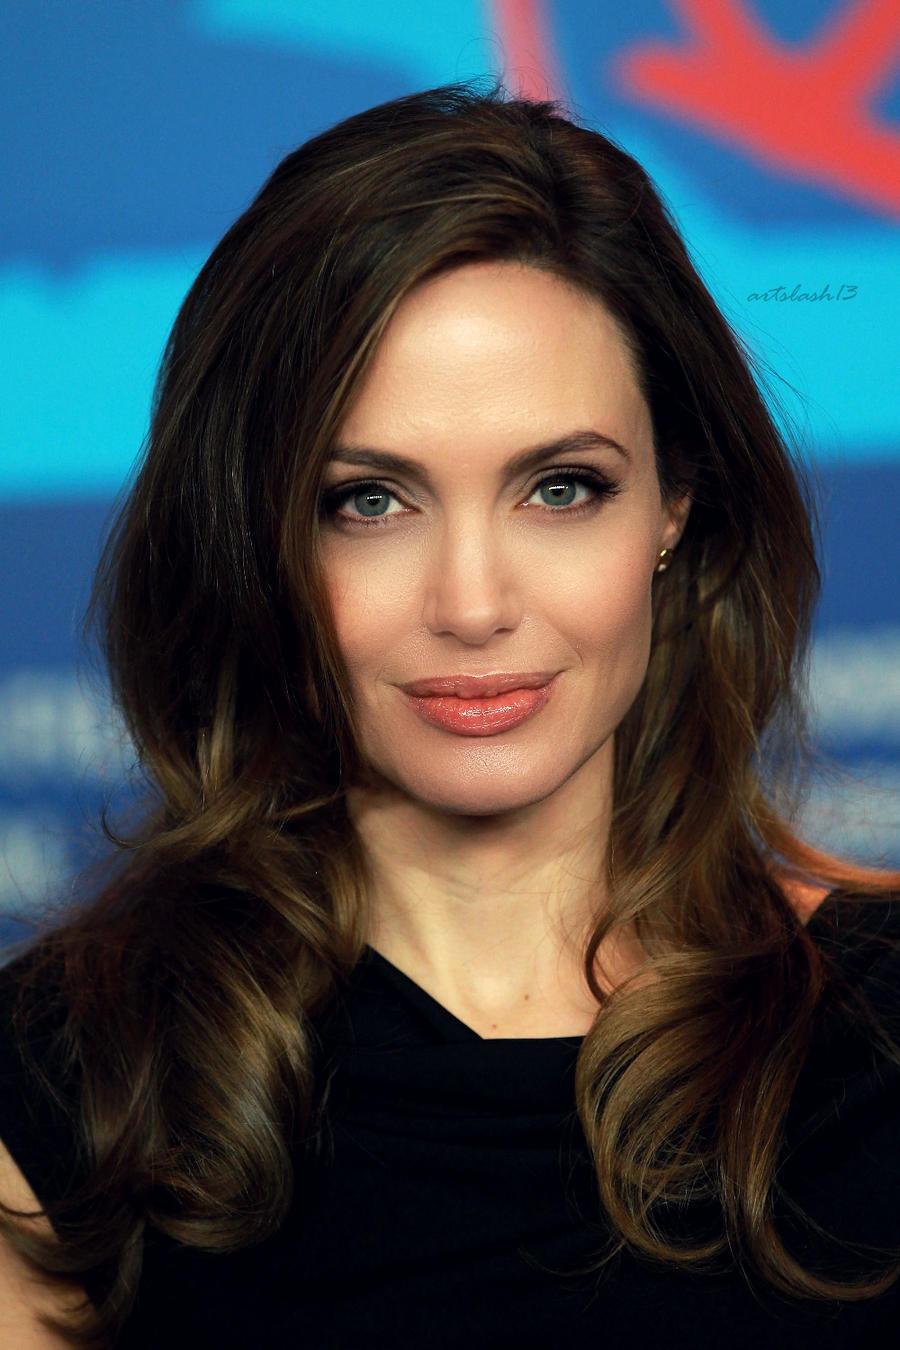 Angelina Jolie 11 by ArtSlash13